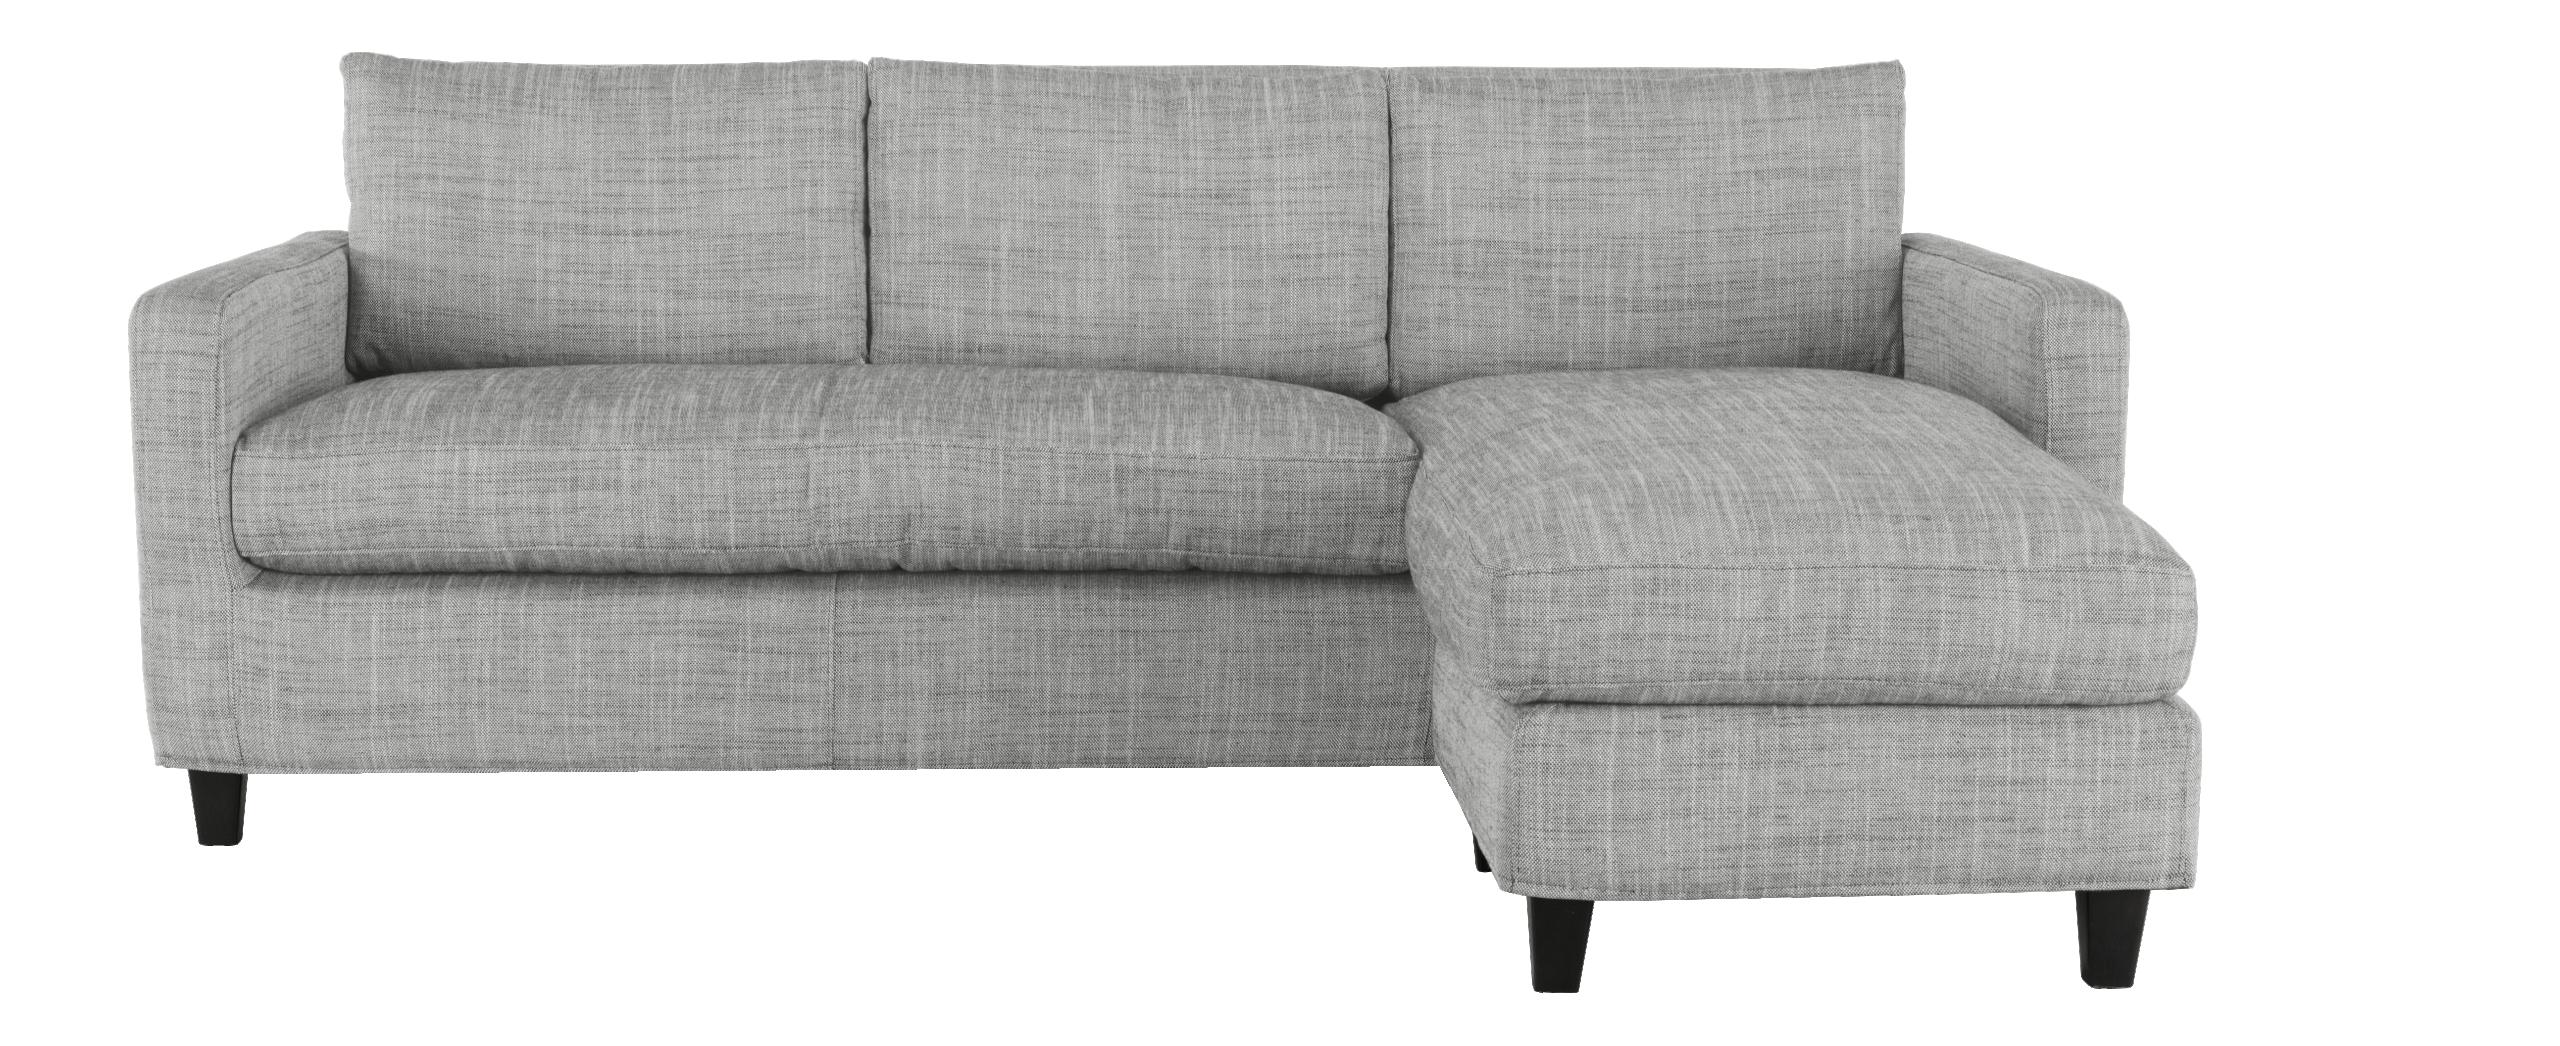 CHESTER Sofas Corner sofa Mouse grey Fabric   Déco   Pinterest ...